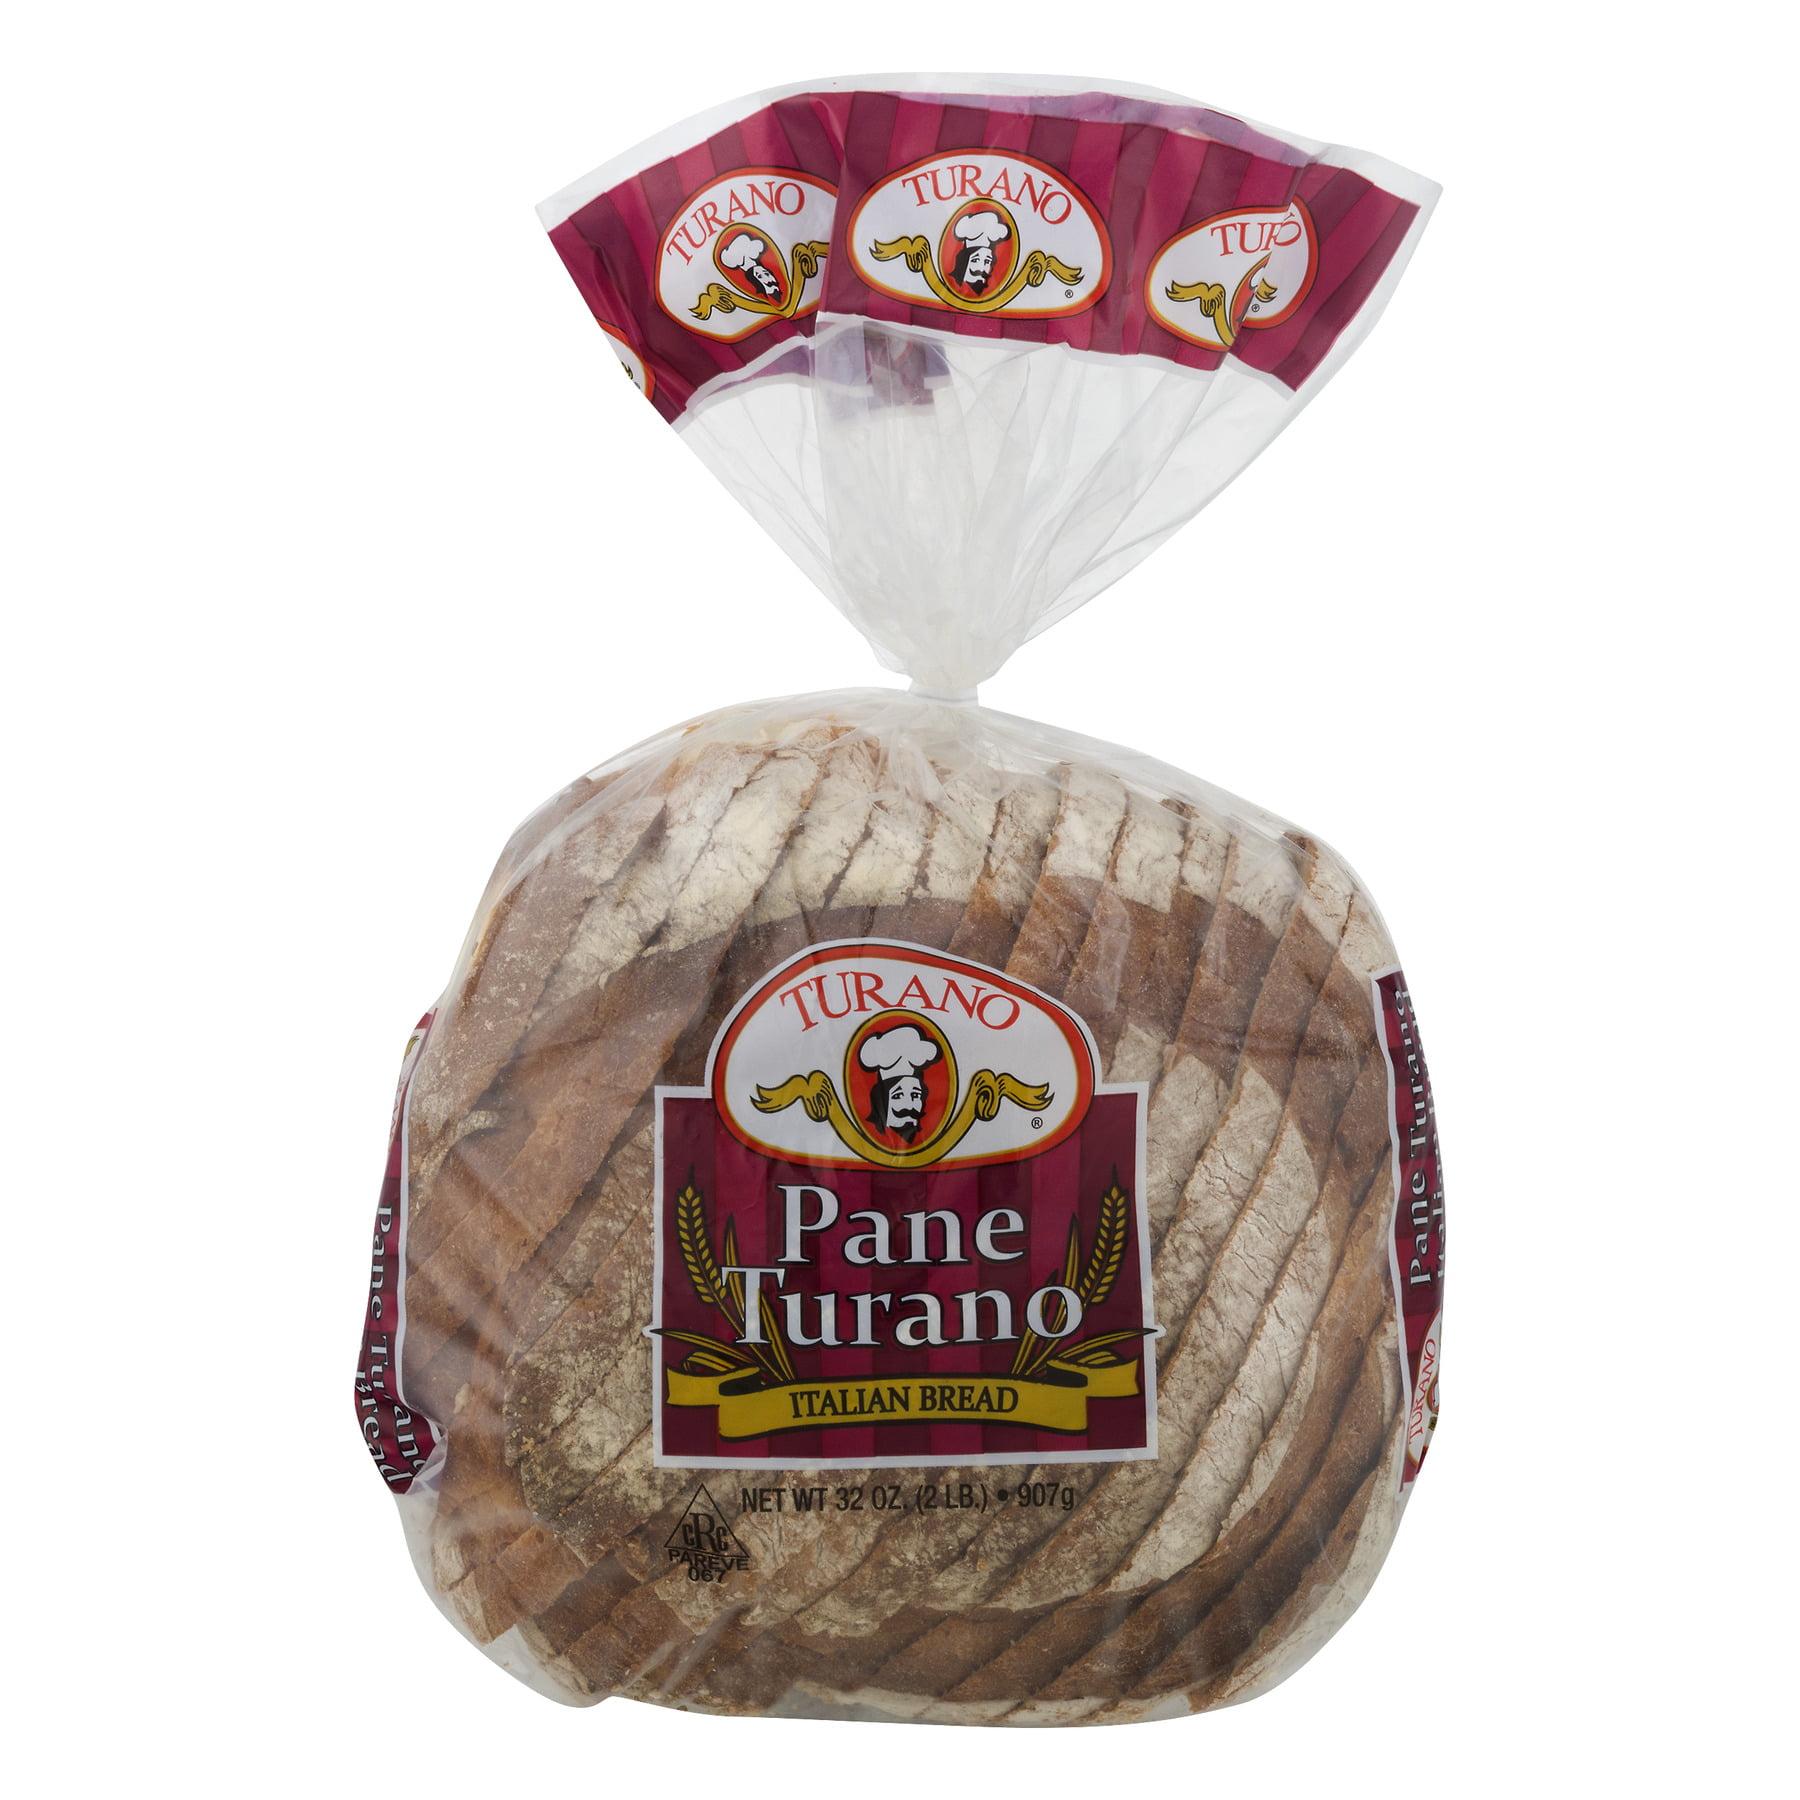 Turano Italian Bread Pane Turano, 16 ct